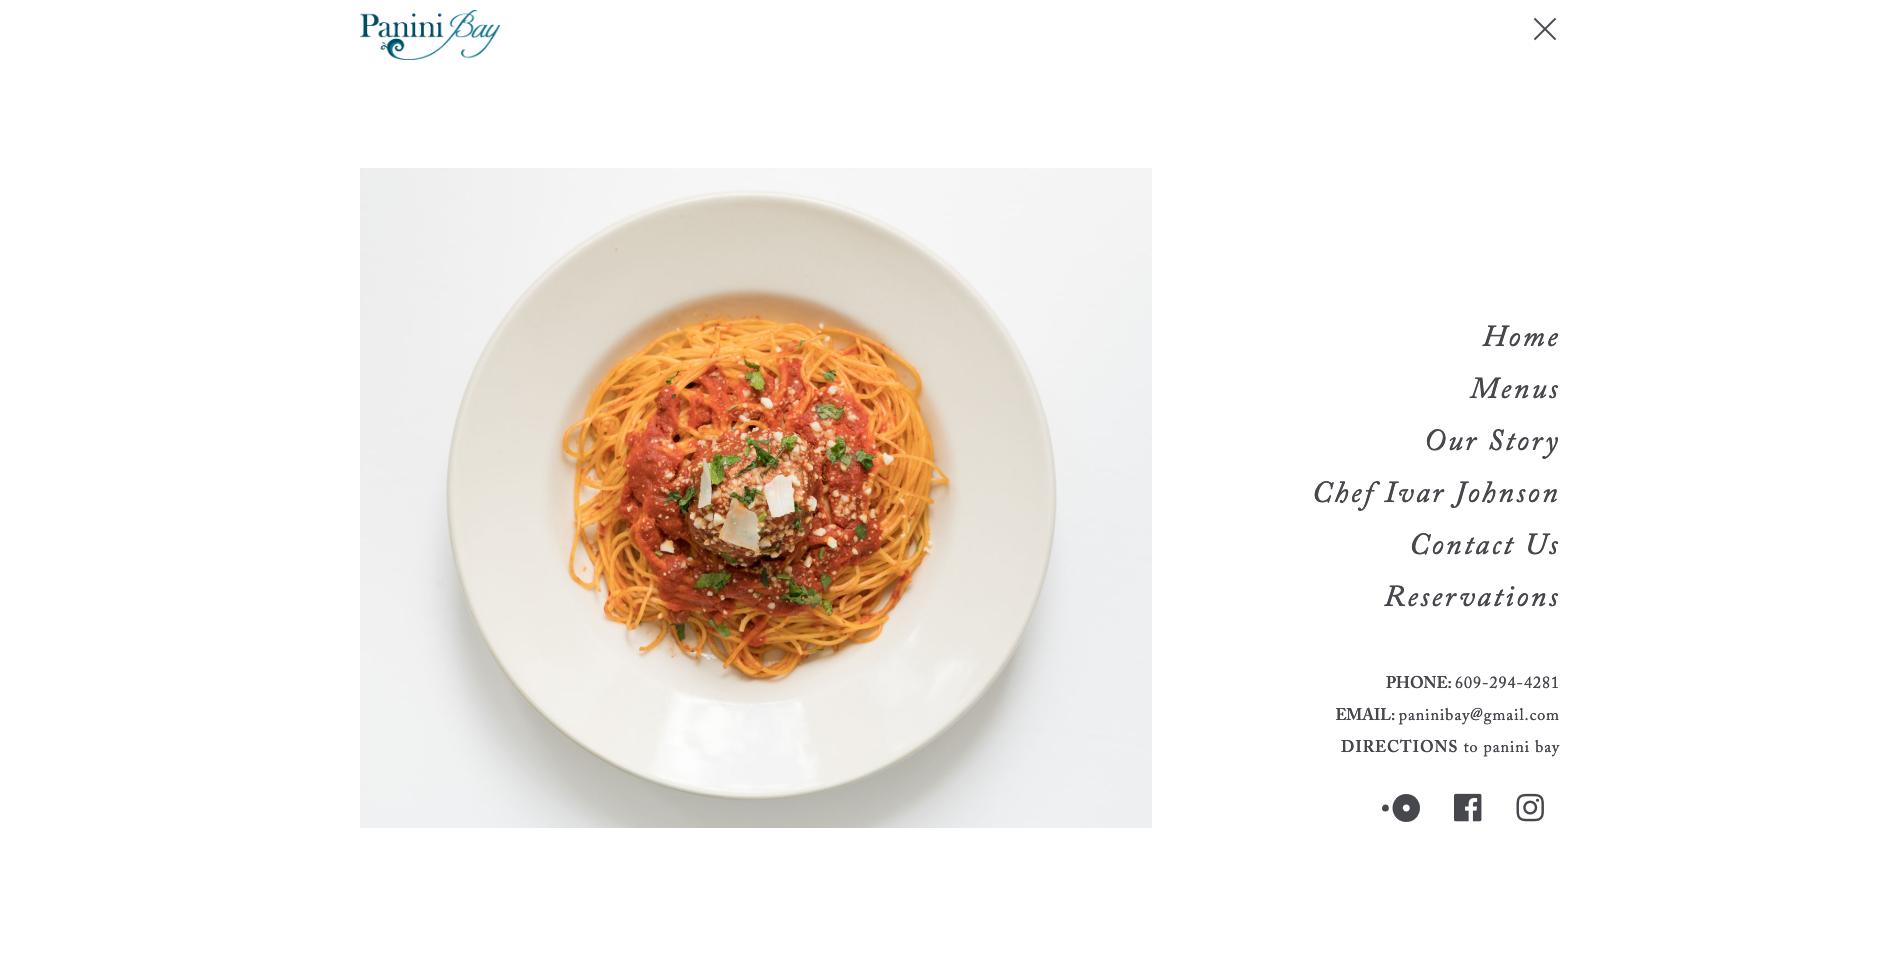 Panini Bay Restaurant Website Design